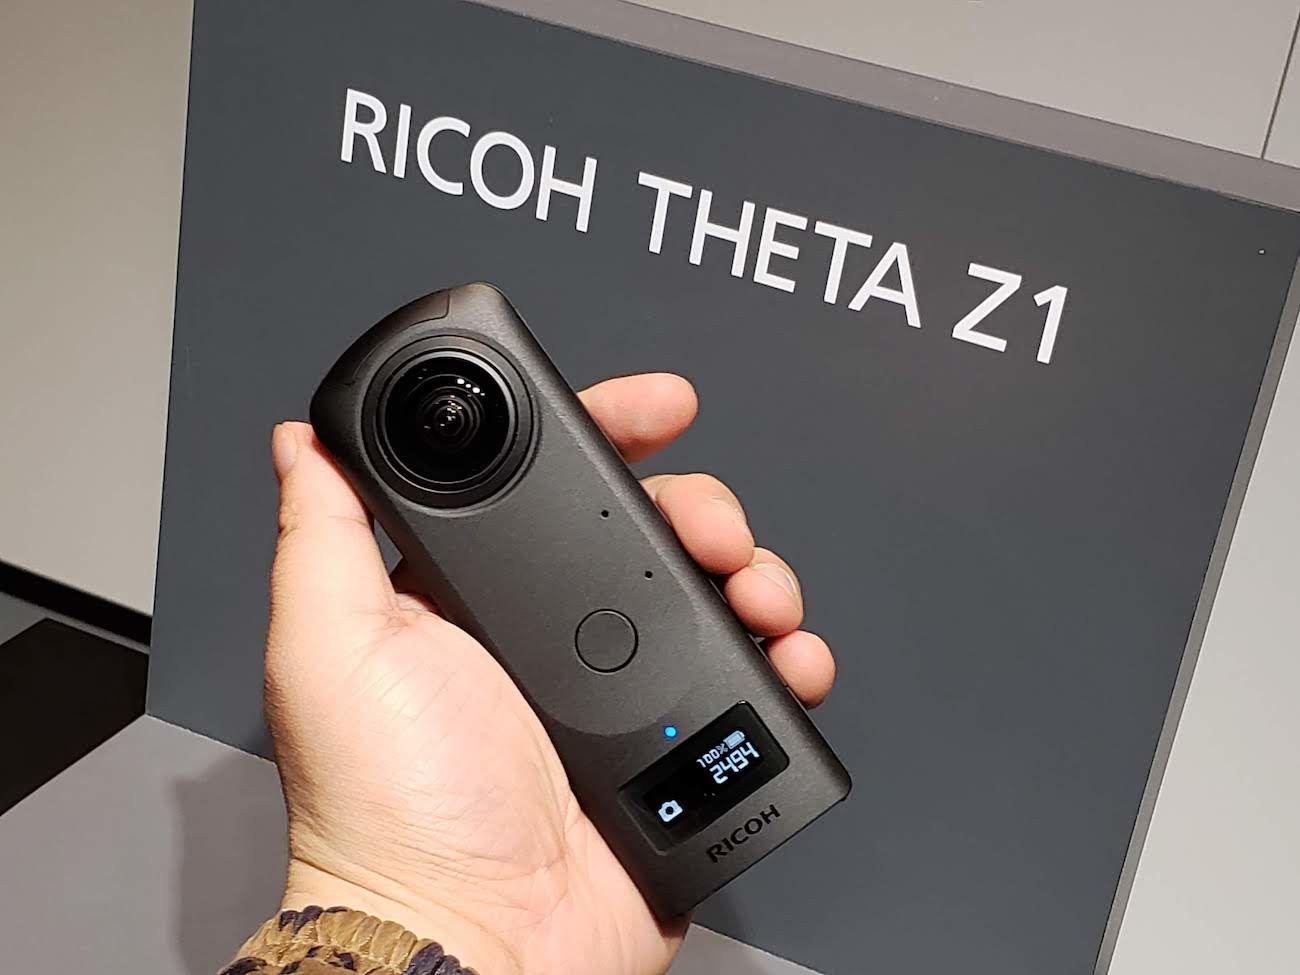 Ricoh Theta Z1: Specs, Example Images & Price - 360° Camera Reviews